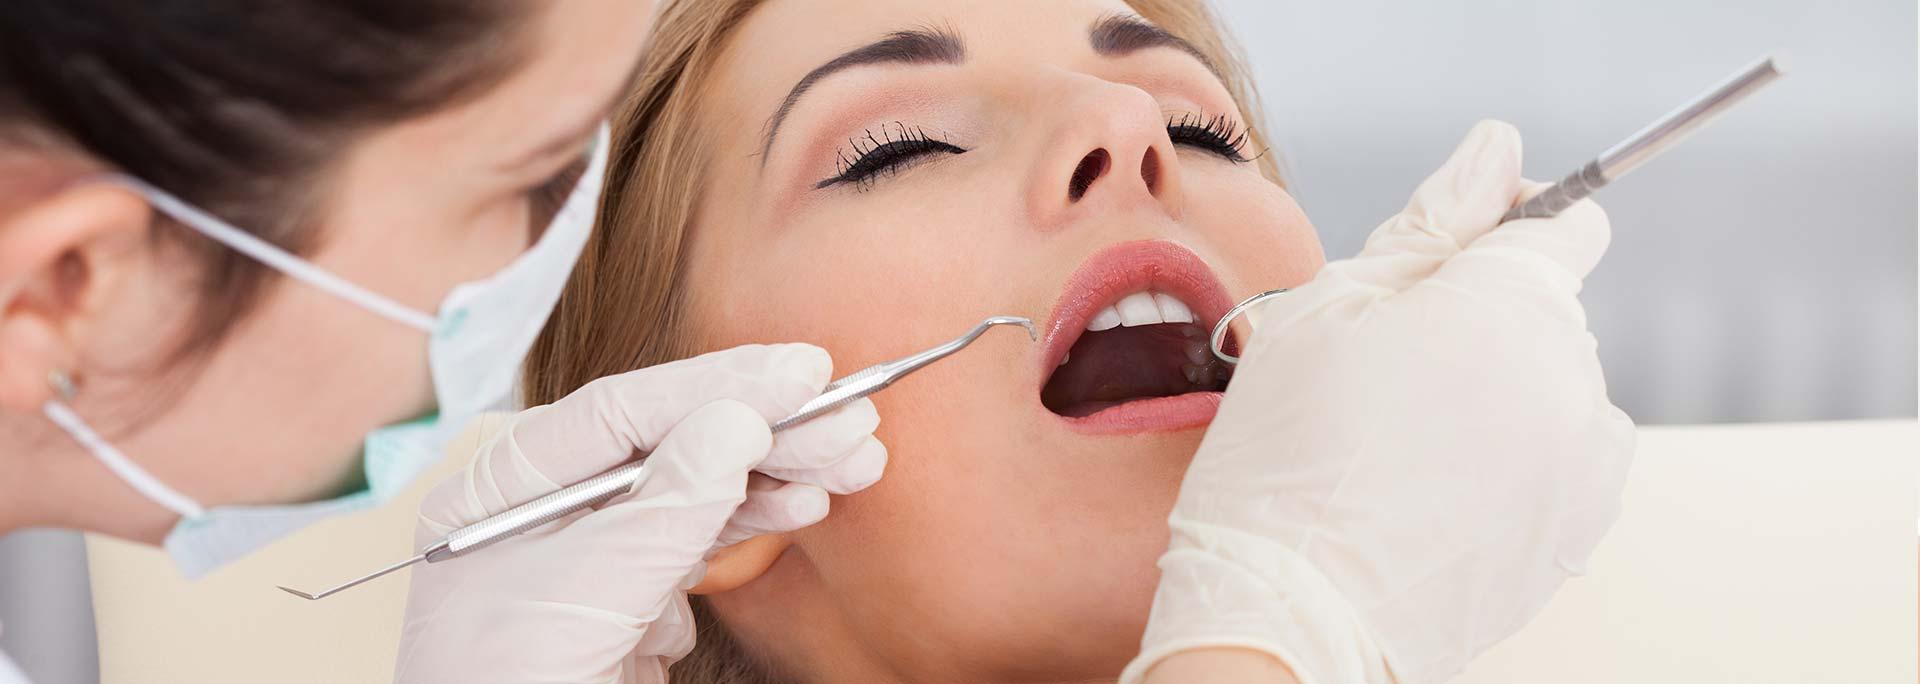 Chestereme Sedation Dentistry